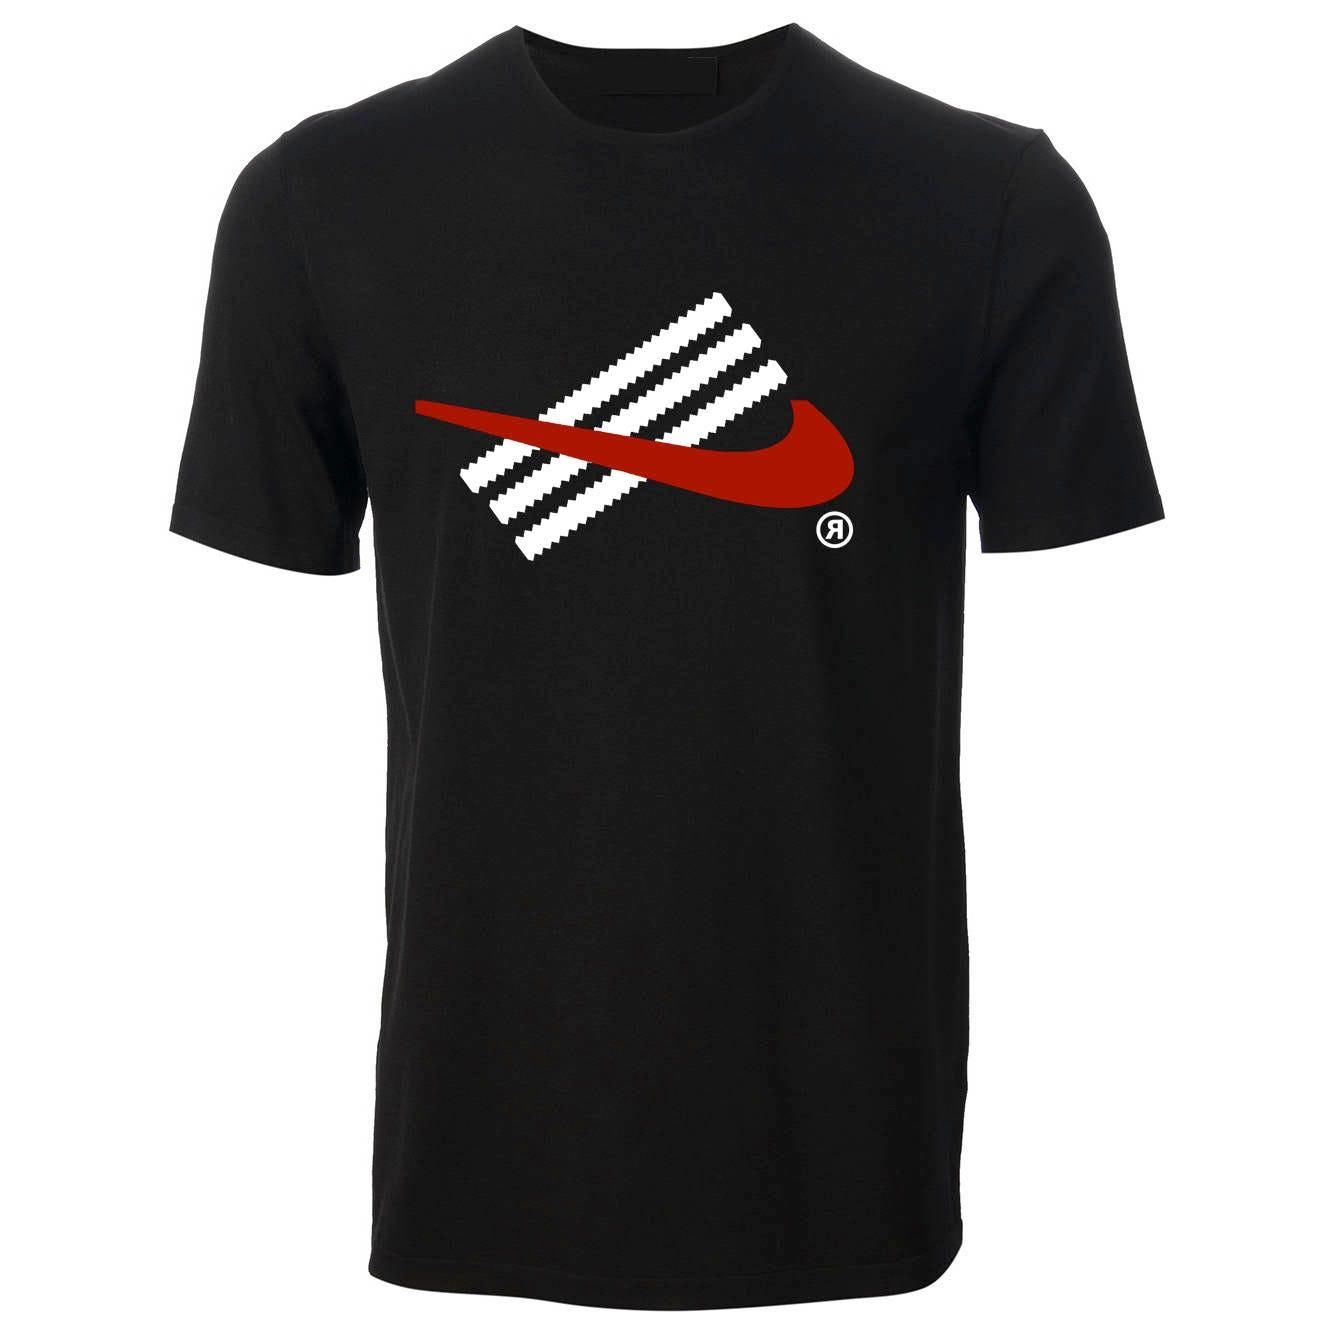 Fun Adidas and Nike Inspired TShirt Black  Birthday Gift Present